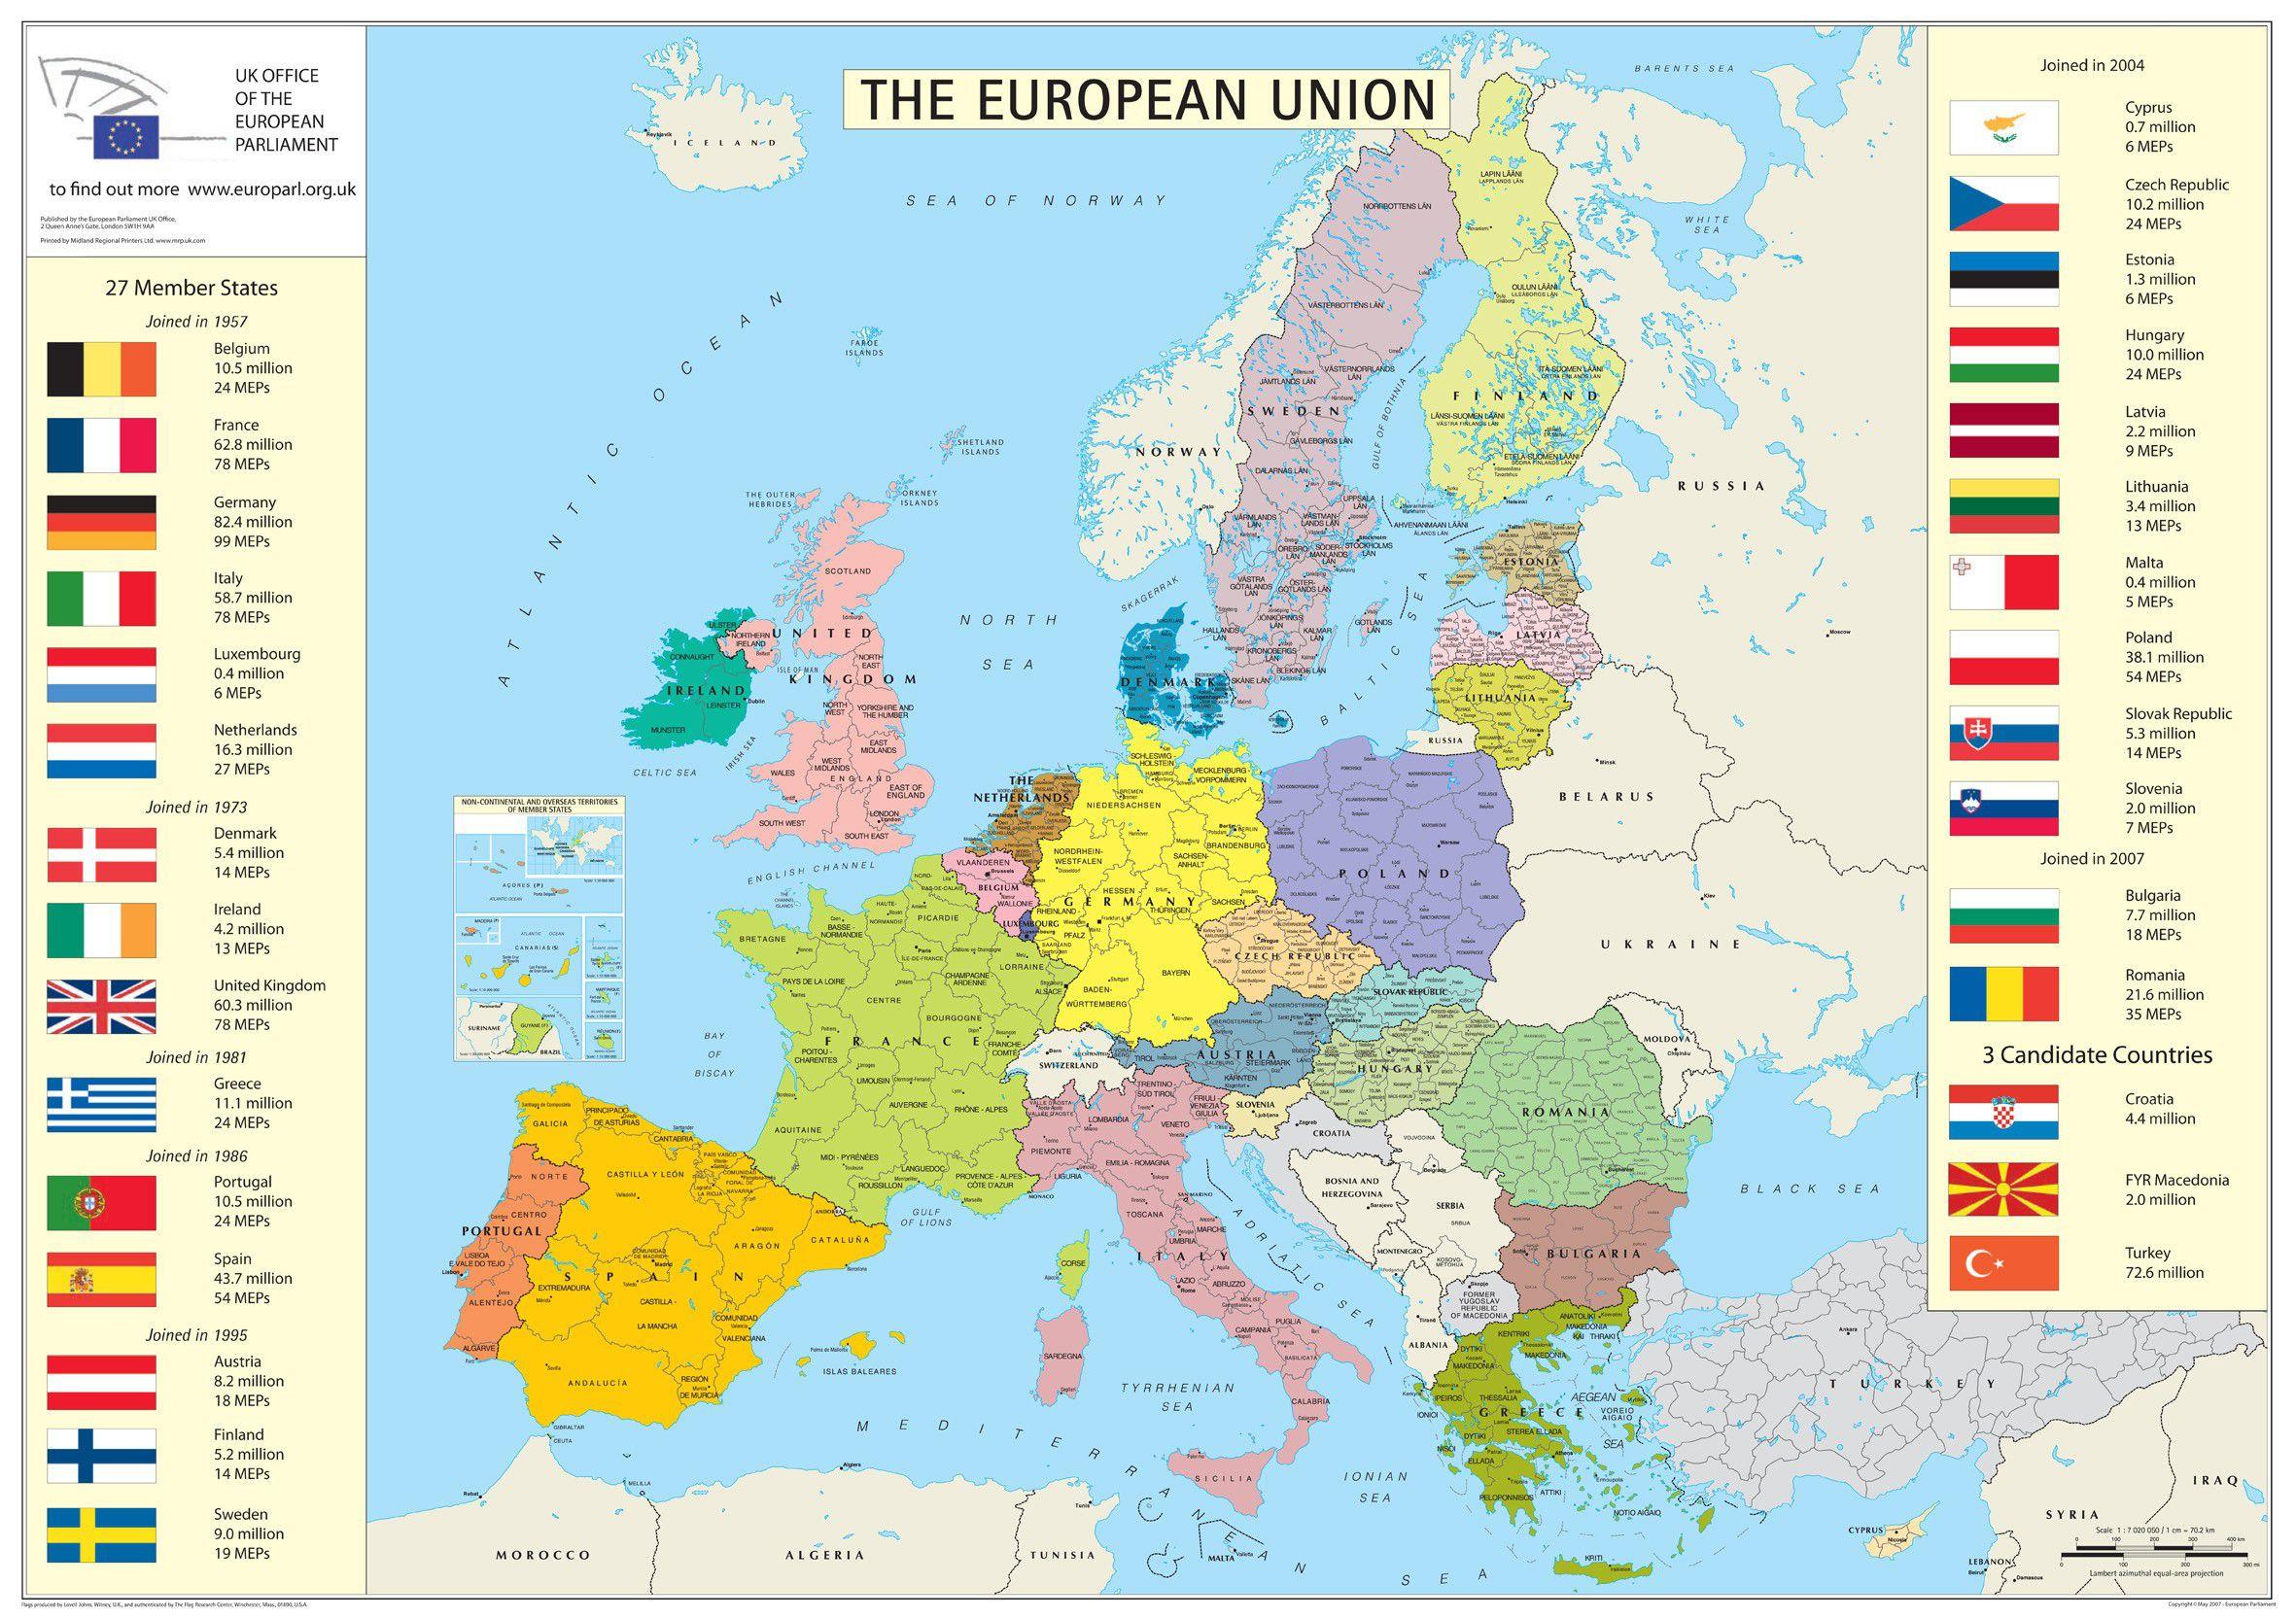 the european union and the adoption of the euro Didates delay the adoption of the euro key words: euro adoption, economic and  monetary union, emerging european countries, economic convergence.